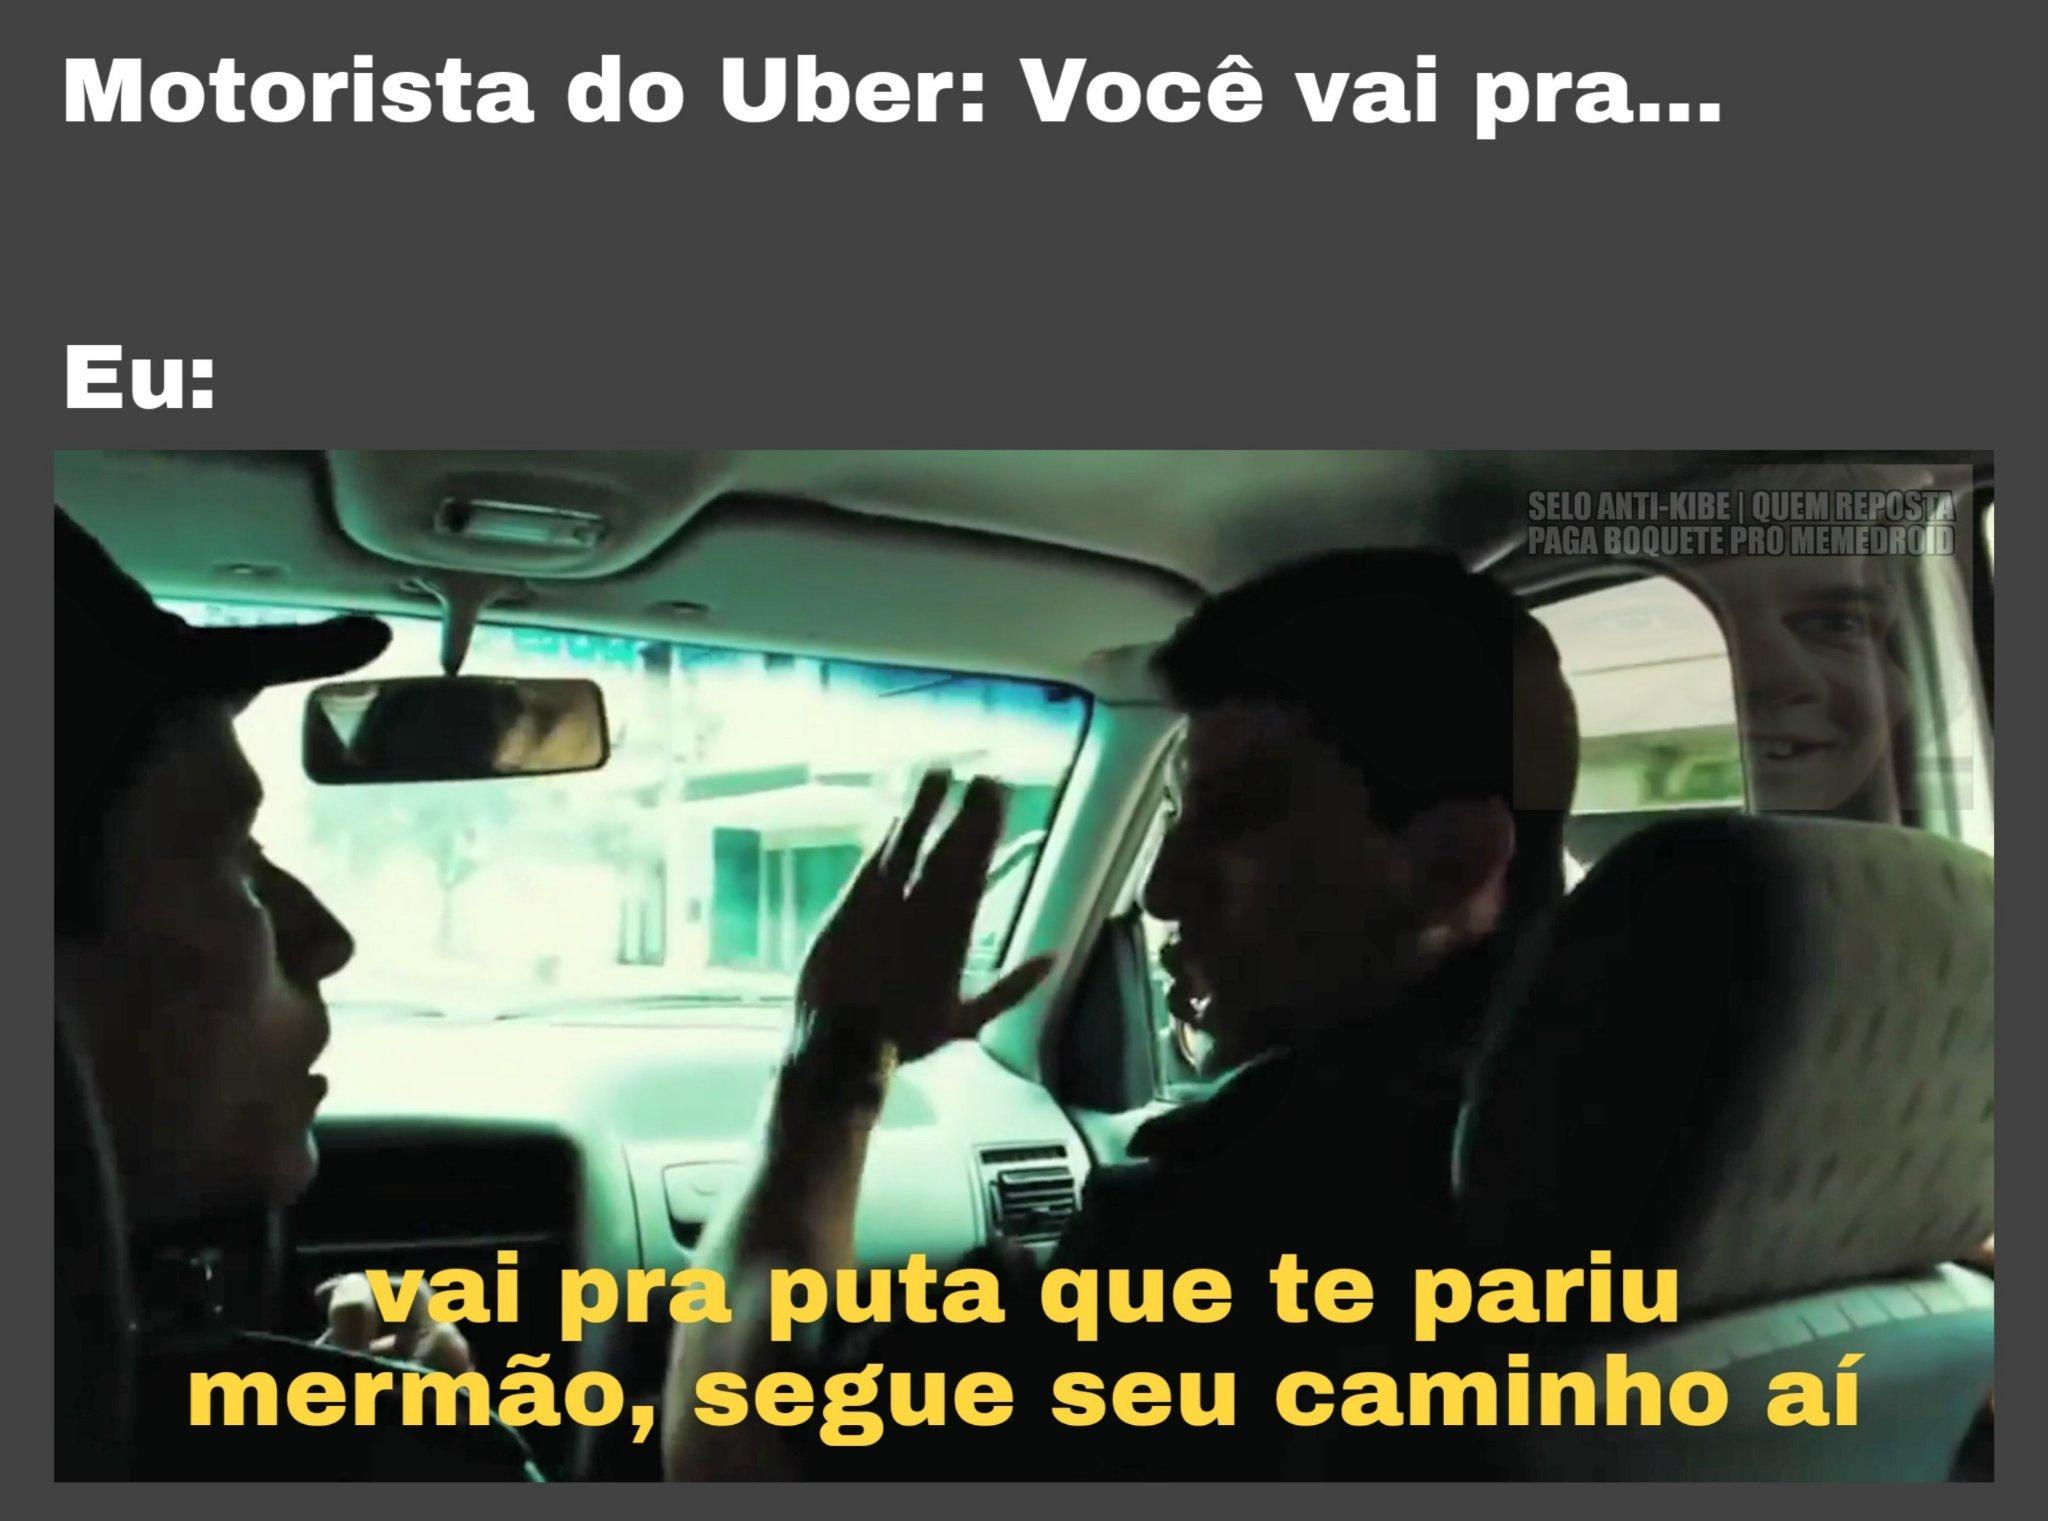 Motorista do Uber é tudo chato, puta merda - meme